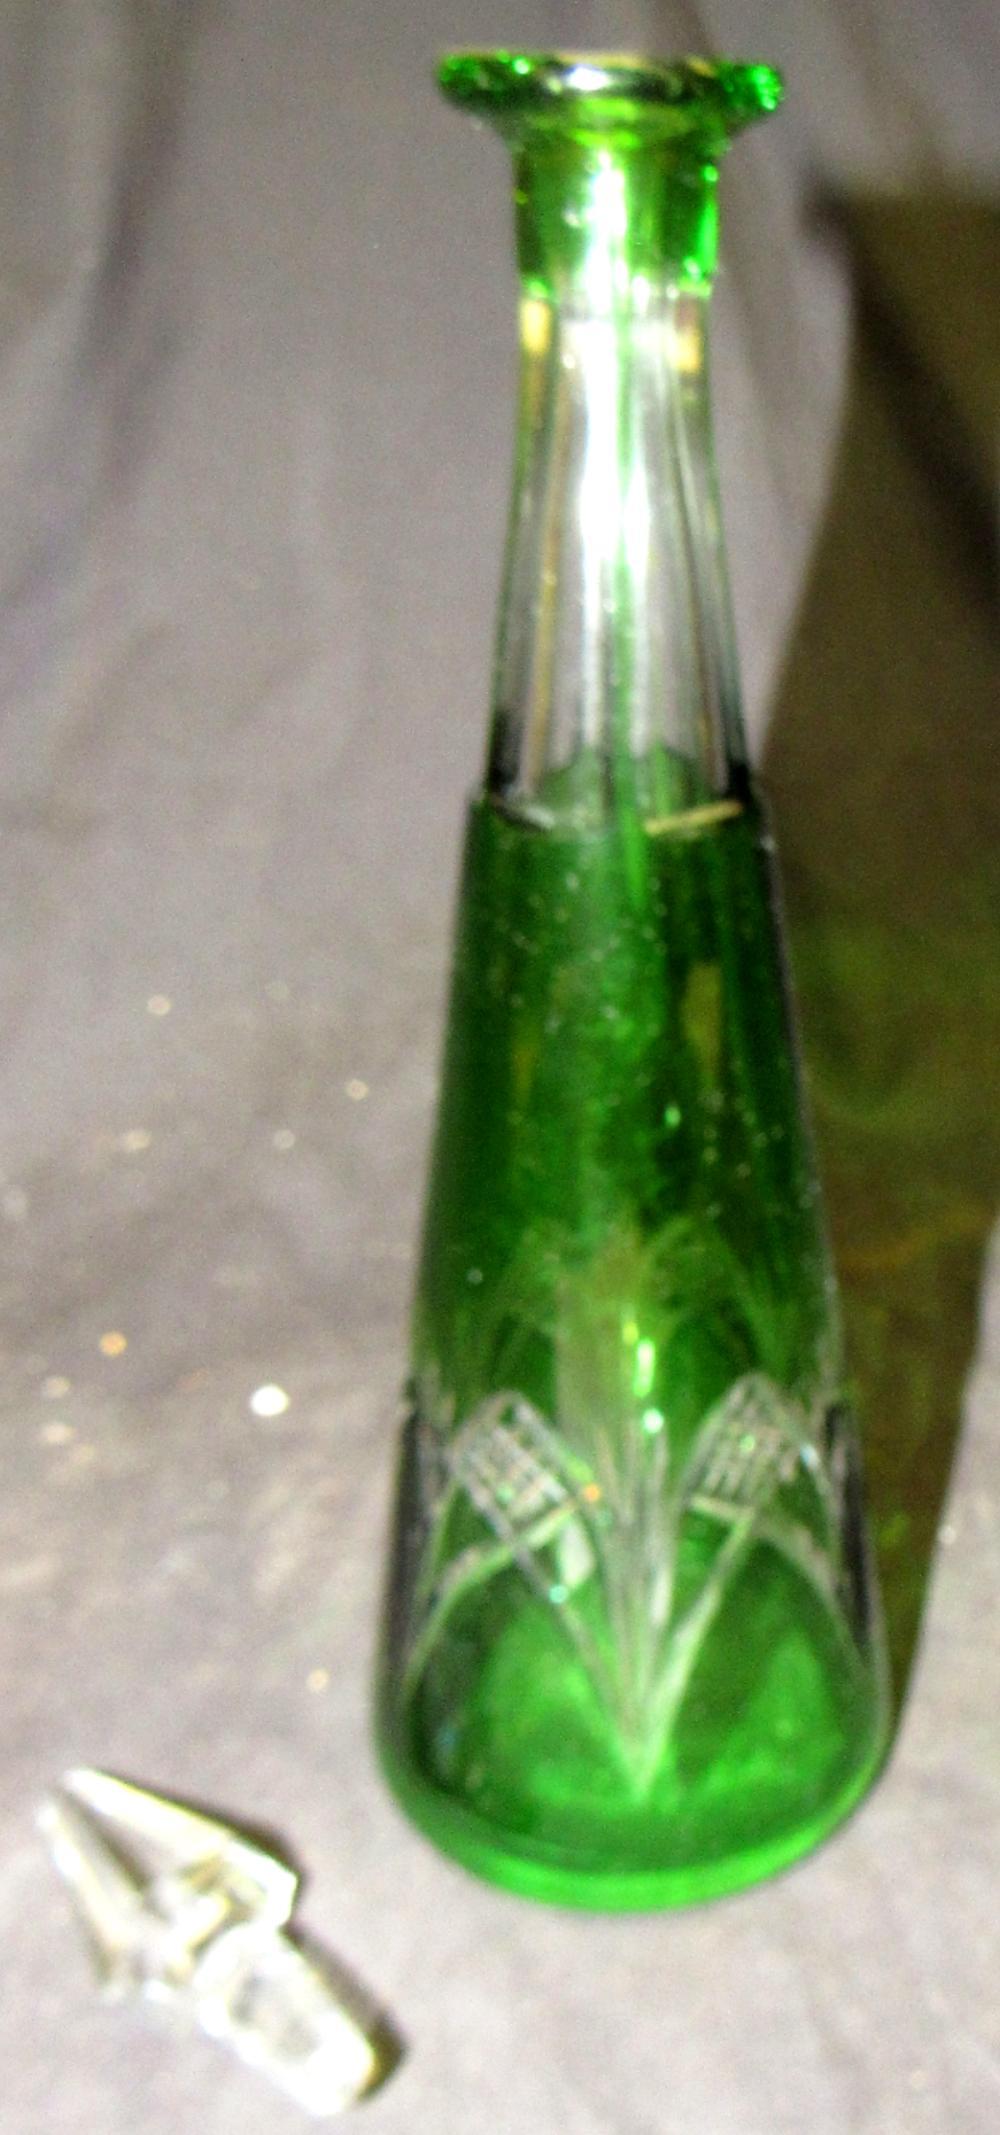 "Lot 143: Bohemium Green Cut to Clear Decanter. 10 3/4""H, EC"